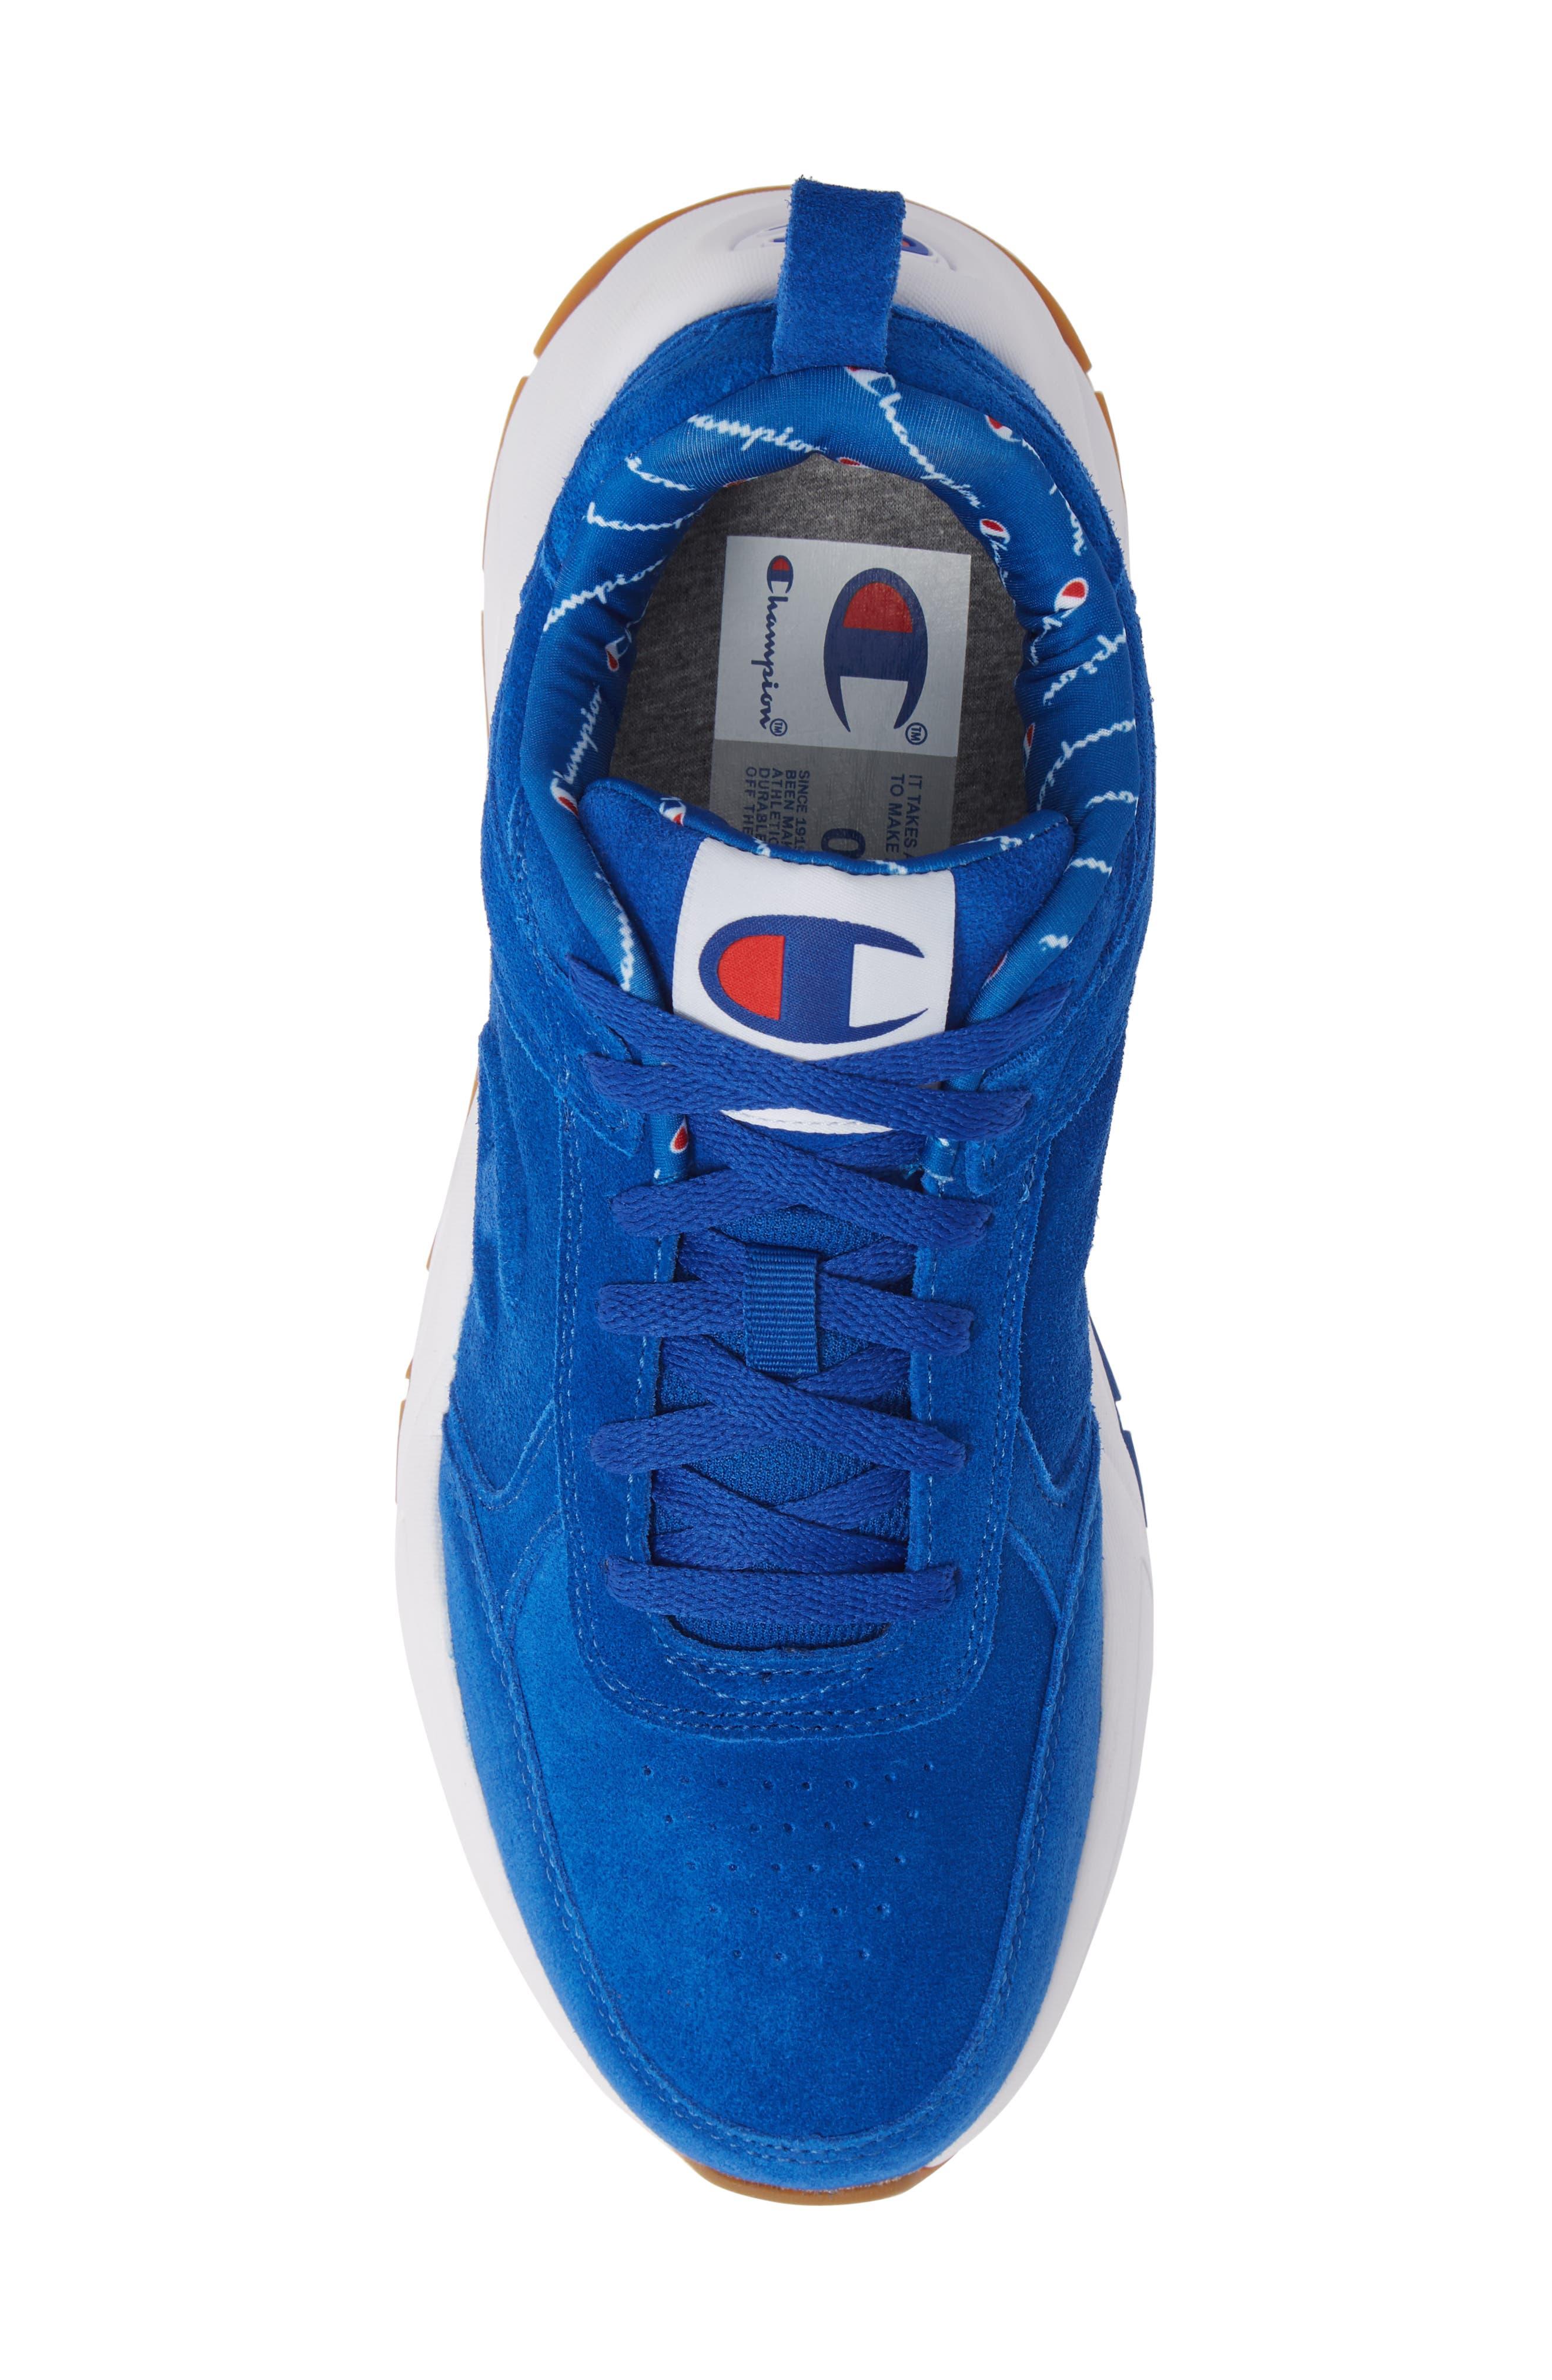 93Eighteen Sneaker,                             Alternate thumbnail 5, color,                             BLUE SUEDE